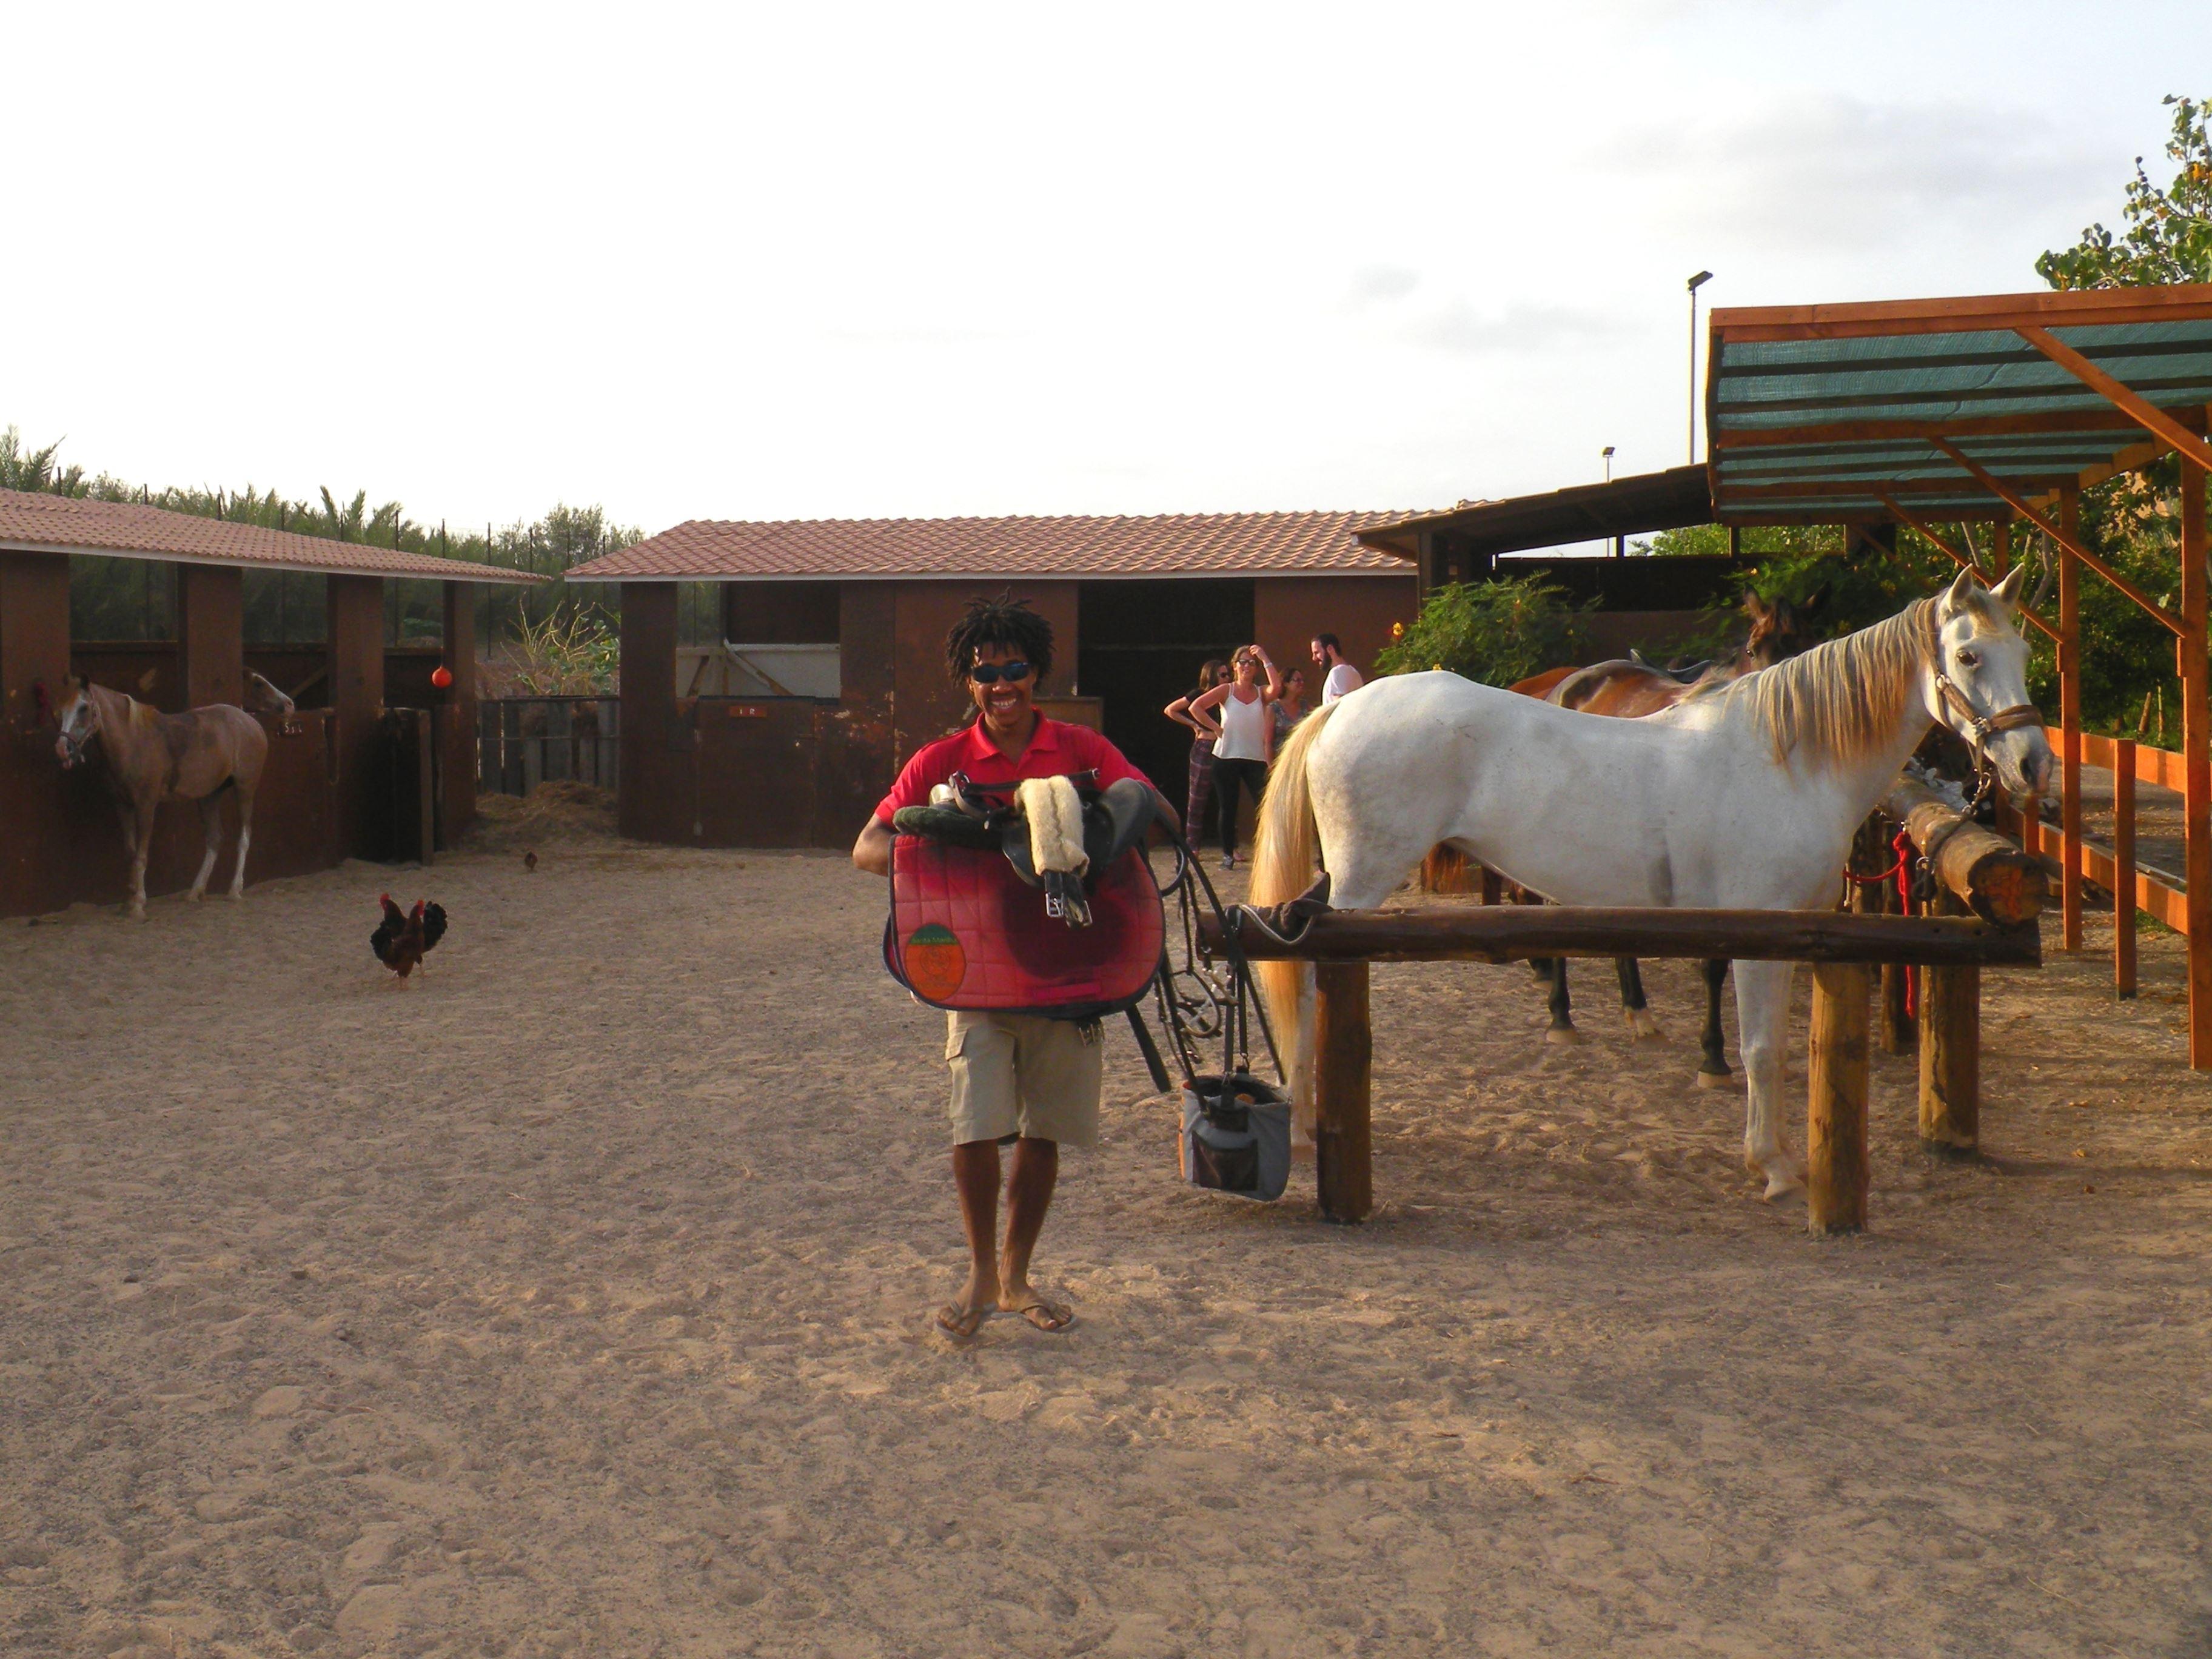 The Riding Centre